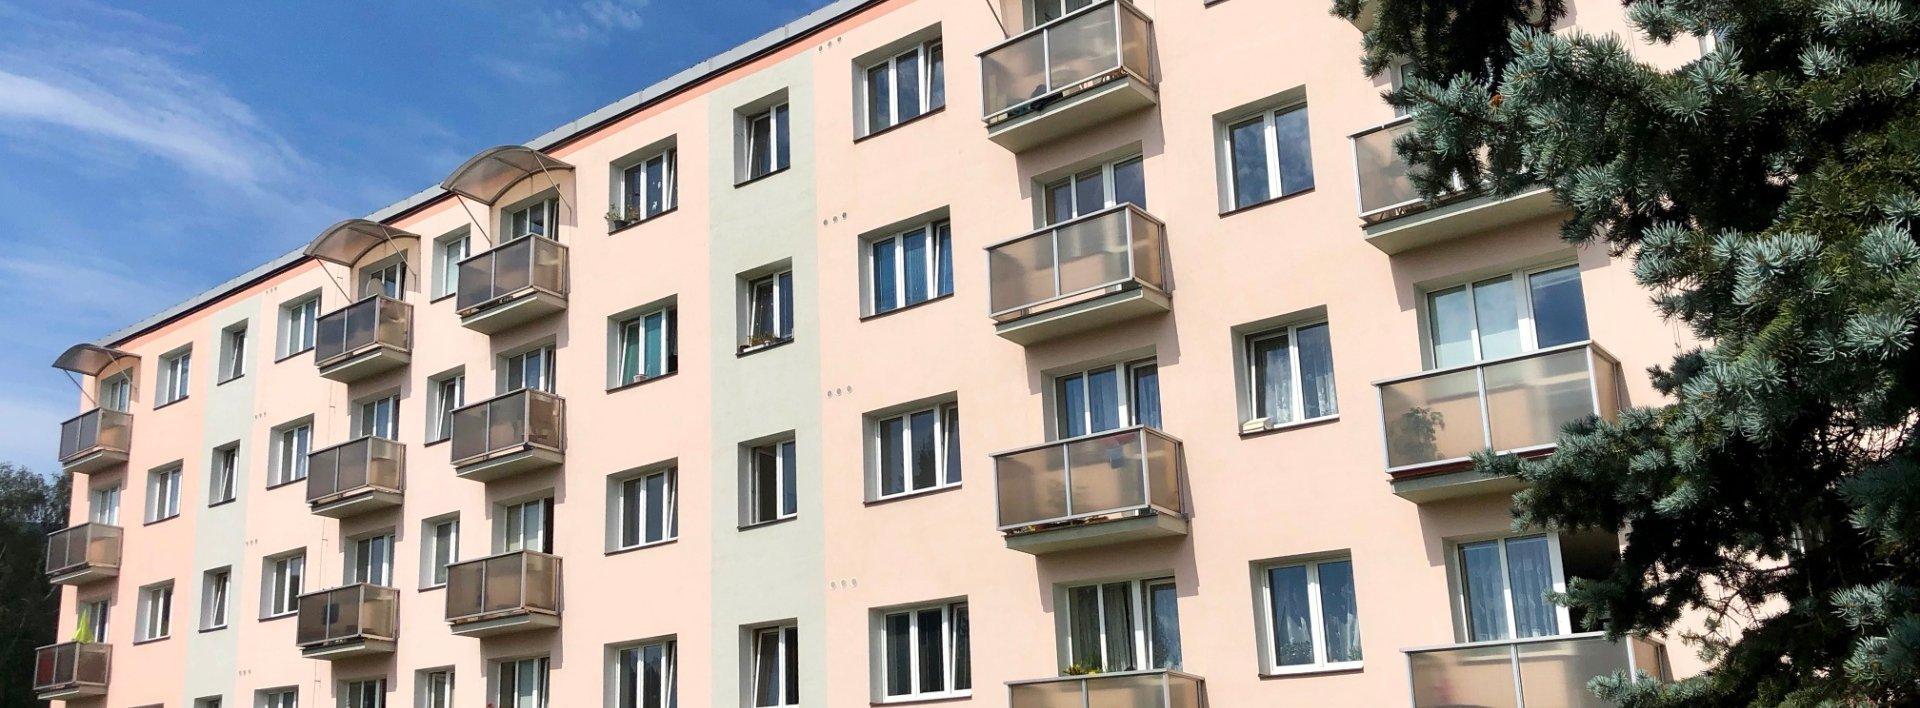 Prodej družstevního bytu 2+1, 51 m² - Liberec XXIV-Pilínkov, Ev.č.: N48923